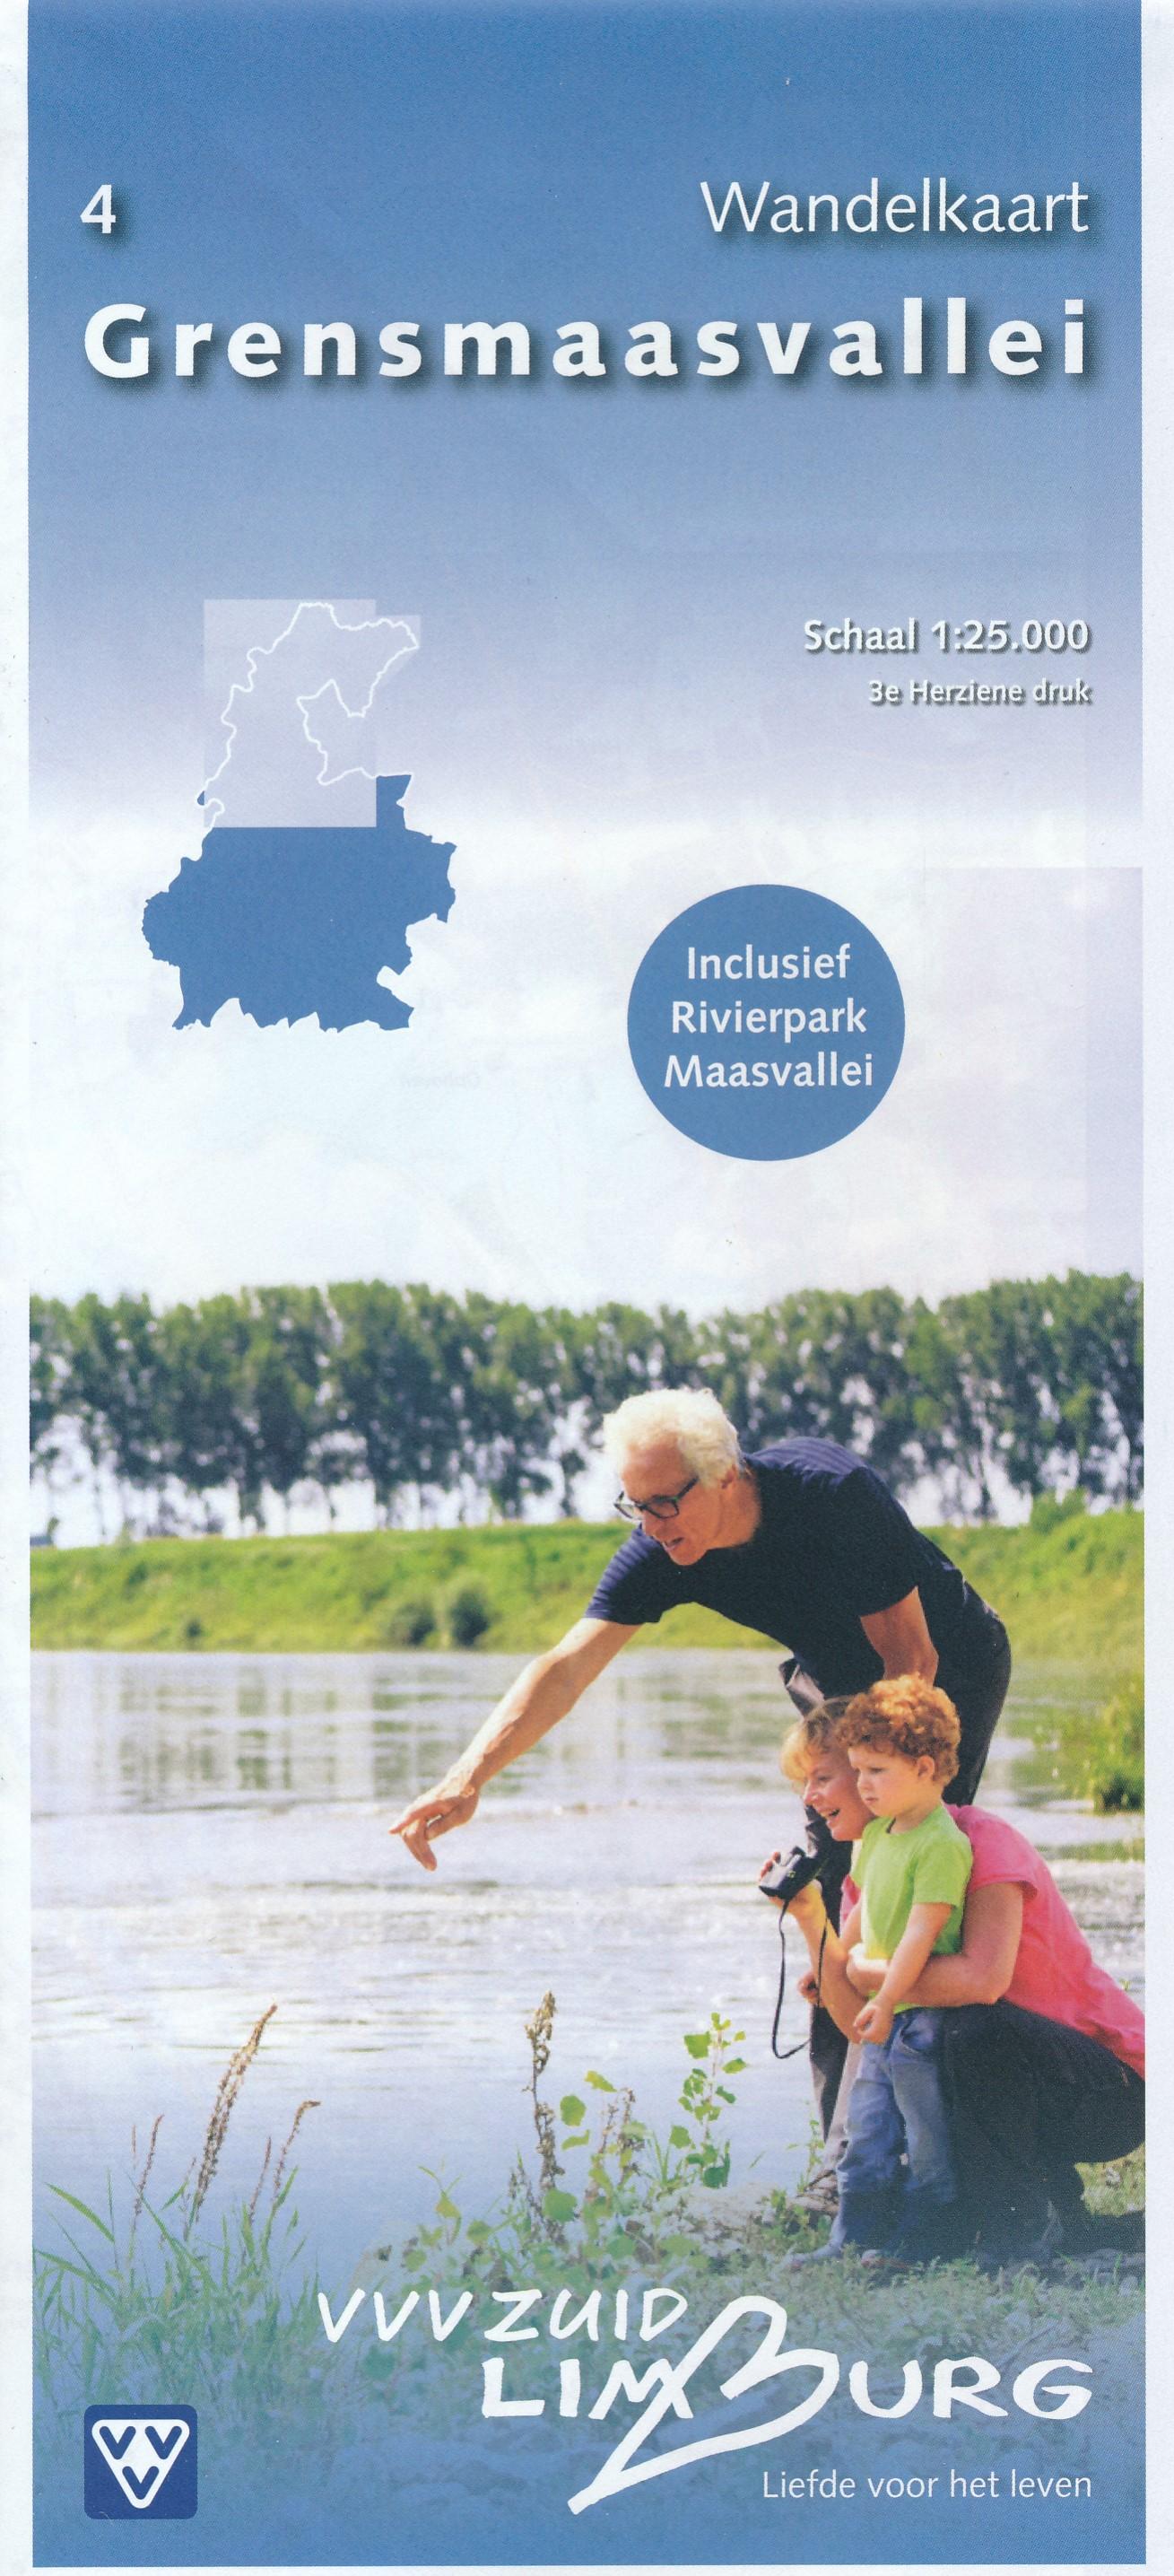 Wandelkaart - Topografische kaart 4 Grensmaasvallei | VVV Zuid Limburg de zwerver